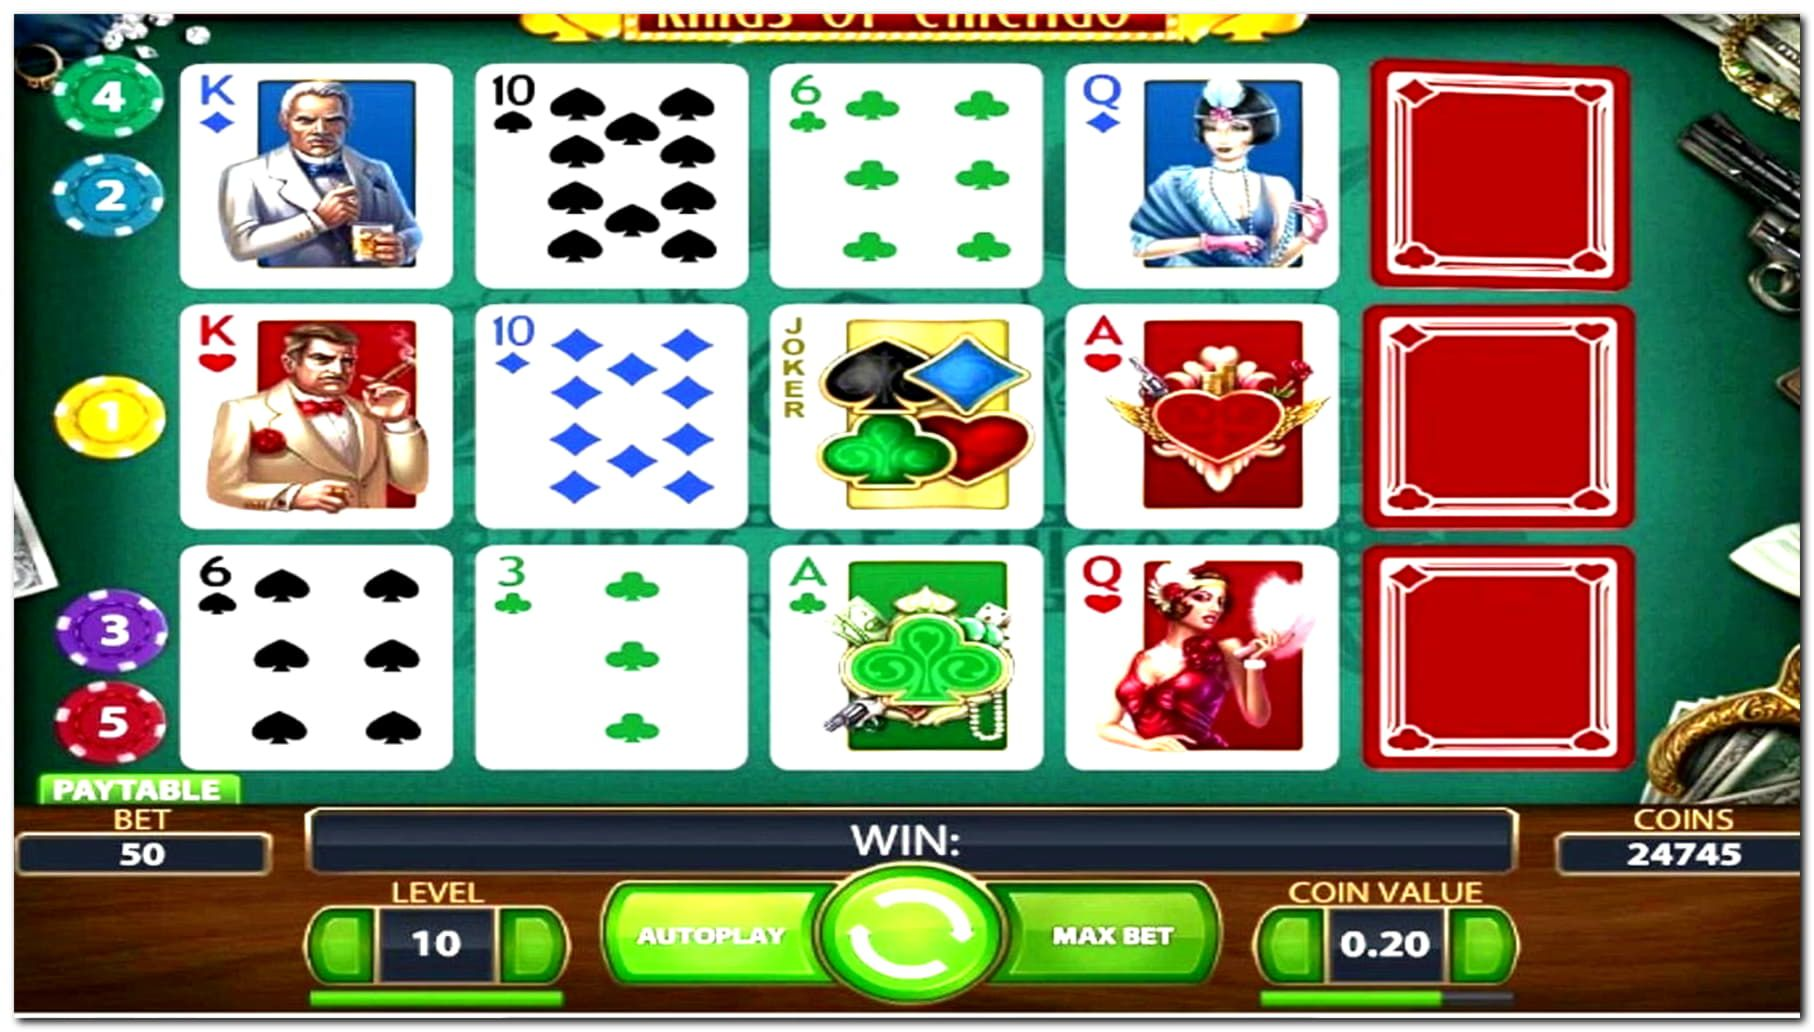 grand mondial casino auszahlen